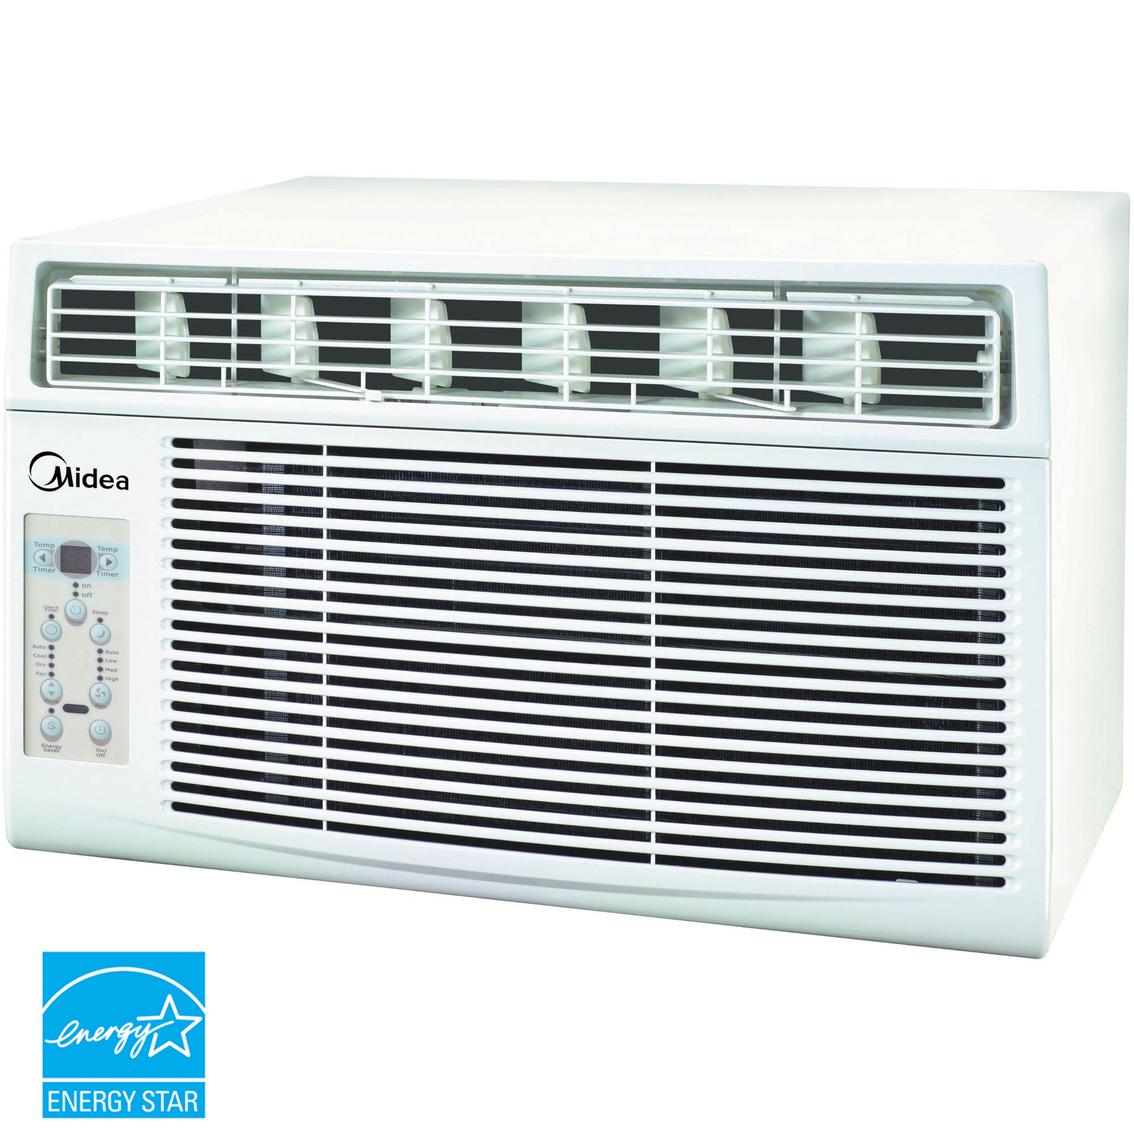 Midea 12 000 btu window air conditioner window air for Window air conditioner